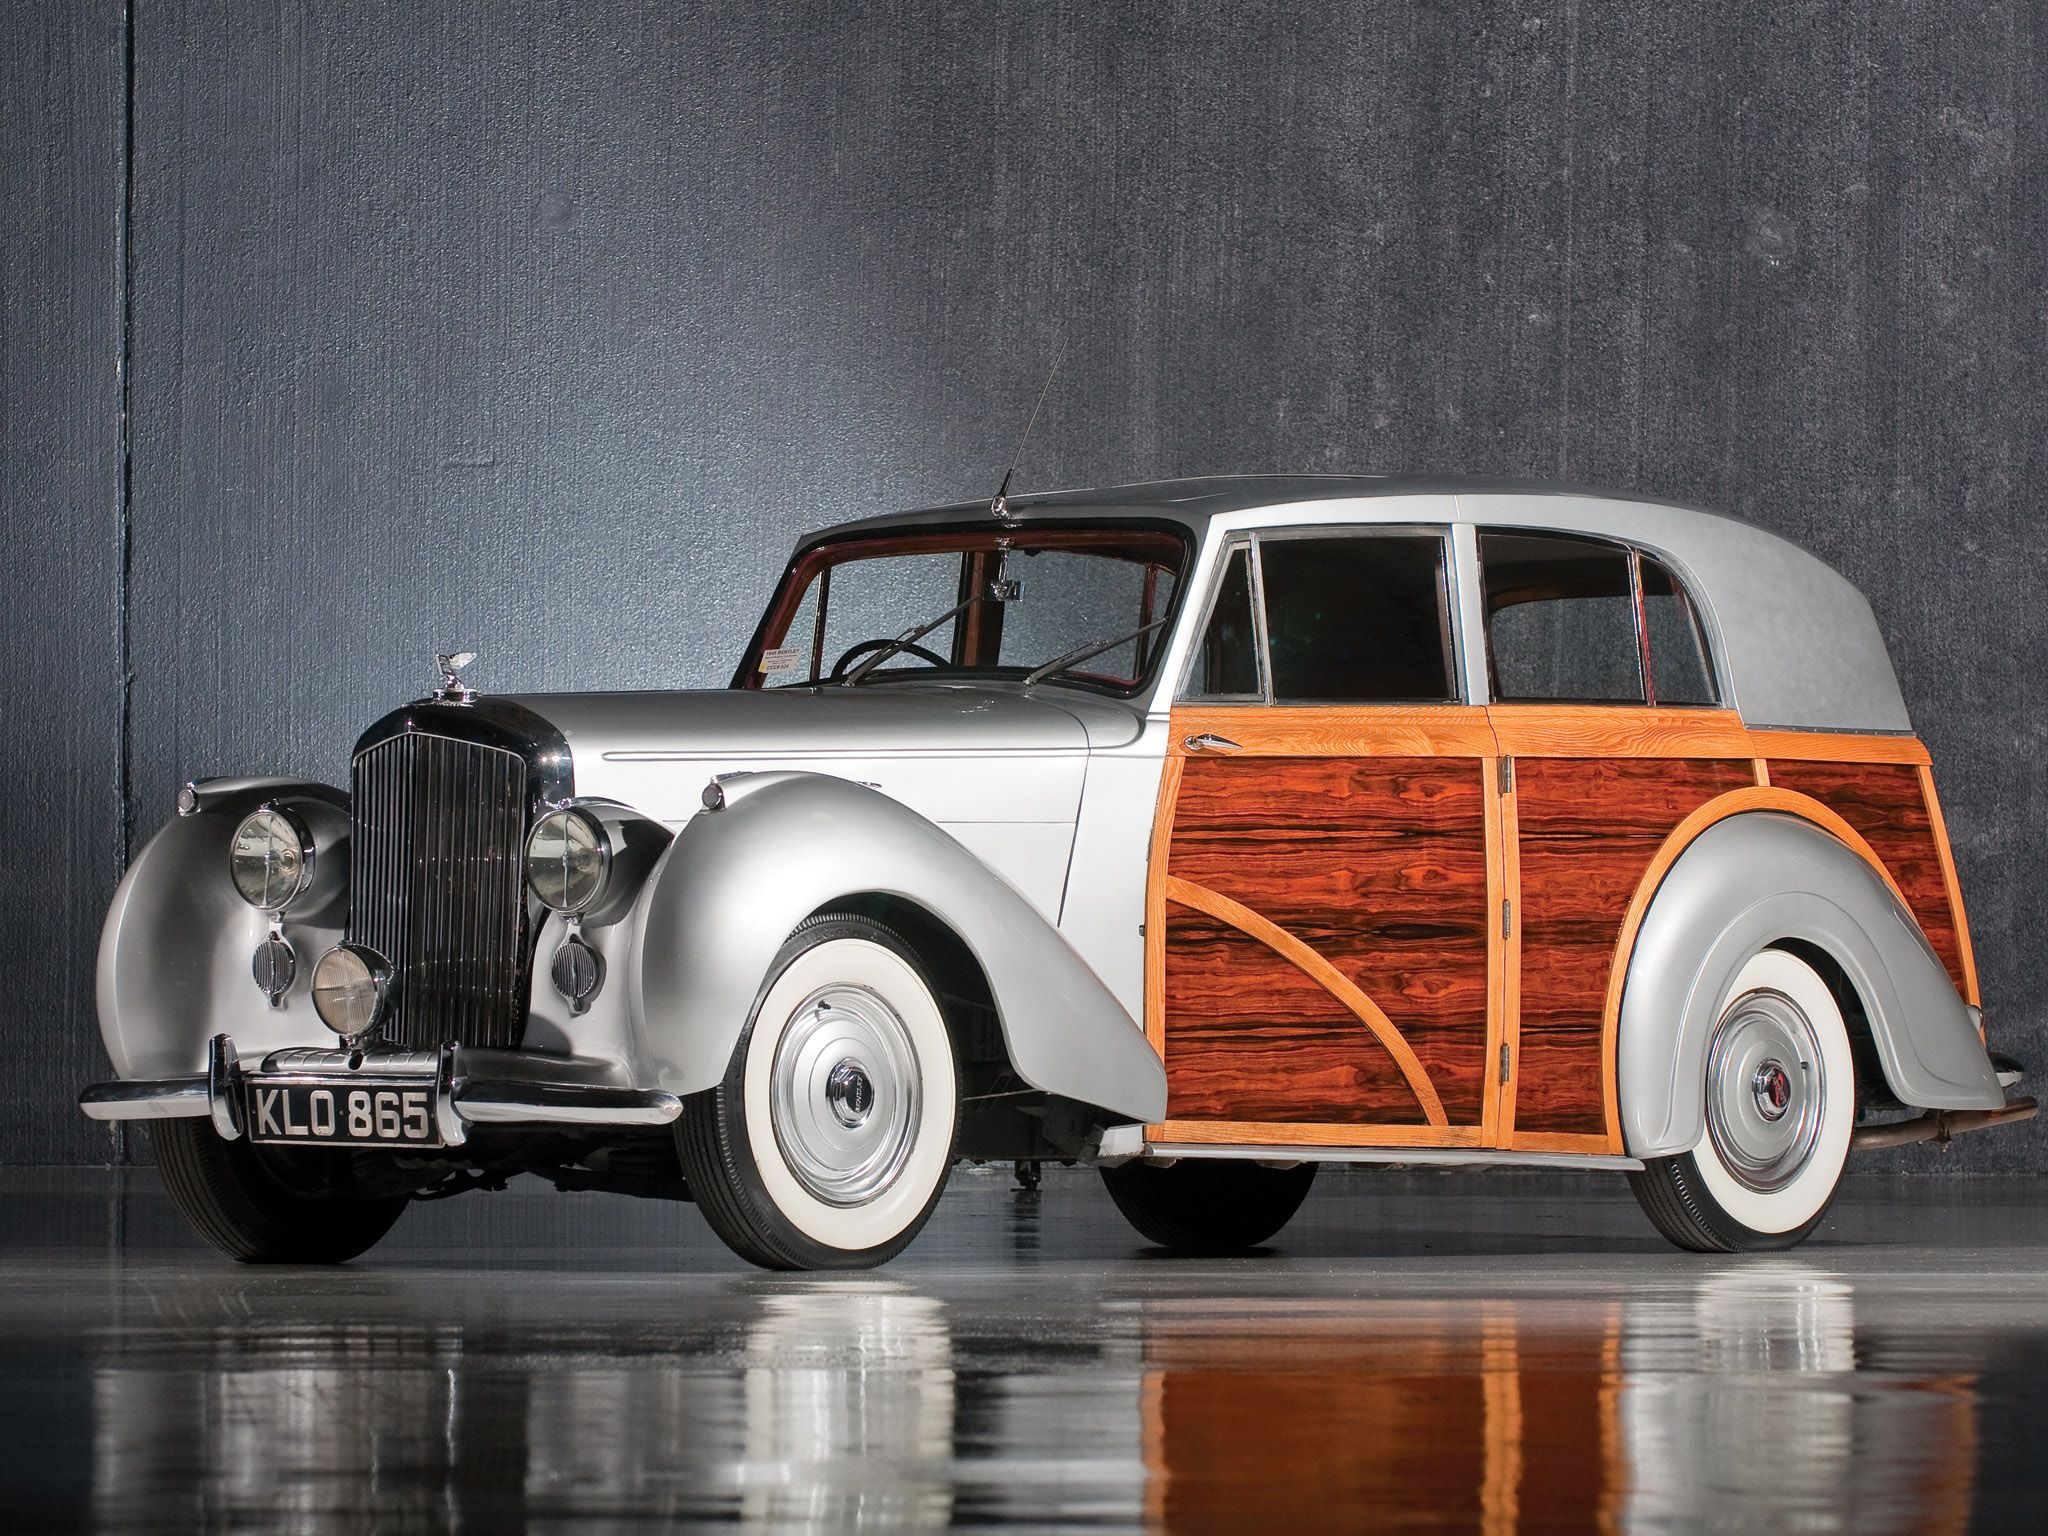 1950 Bentley Mark VI Radford Countryman Cool Cars